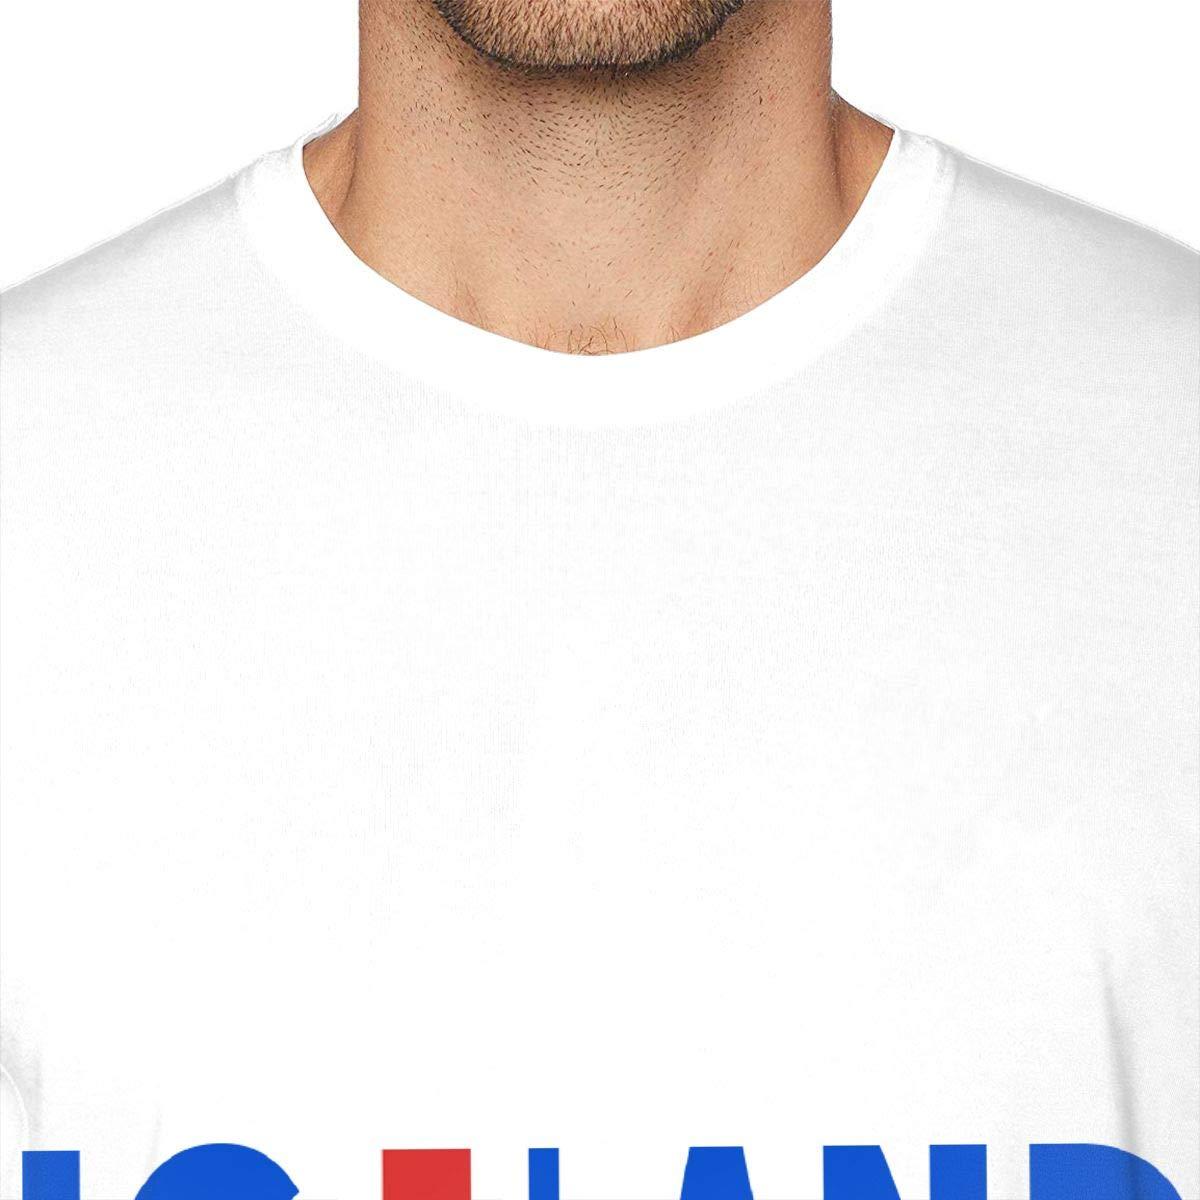 SUMT4men Iceland Mens Crew Neck Short Sleeve T-Shirt Casual Shirt for Men